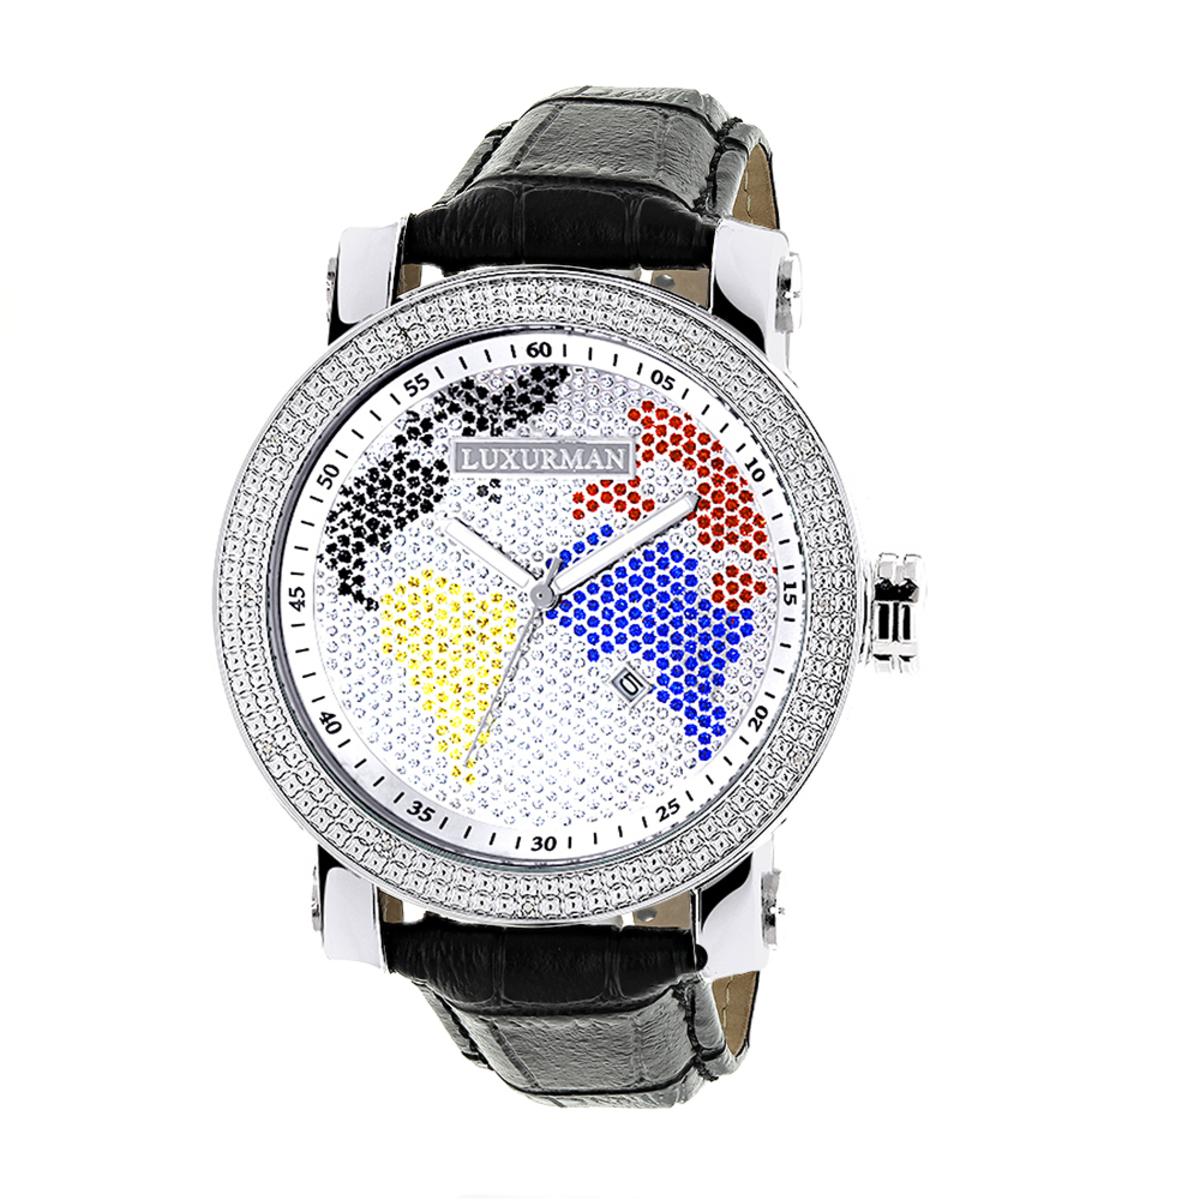 Luxurman Watches Worldface Mens Diamond Watch 0.18ct